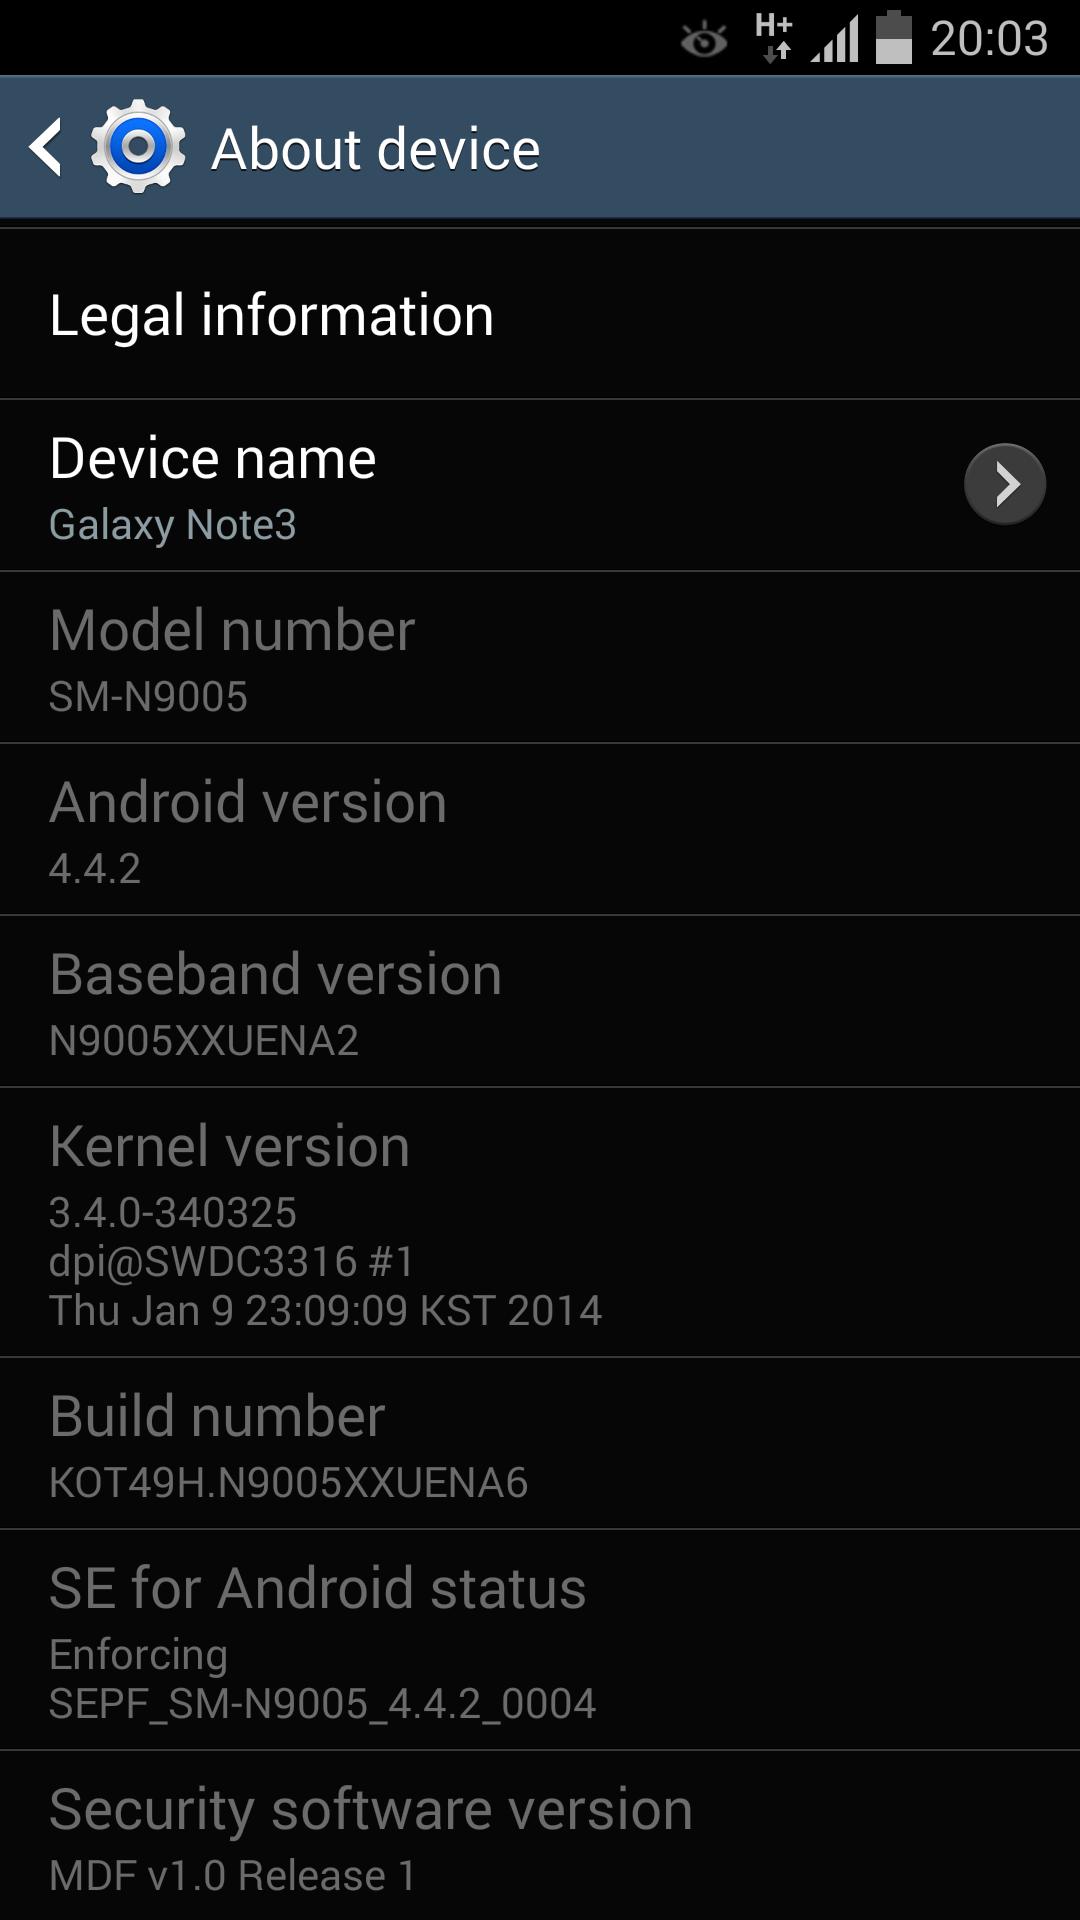 [ROM 4.4.2][SM-N9005] Rom Stock Samsung Android KitKat 4.4.2 [XXUENA6] [12.01.2014] Screenshot_2014-01-12-20-03-13